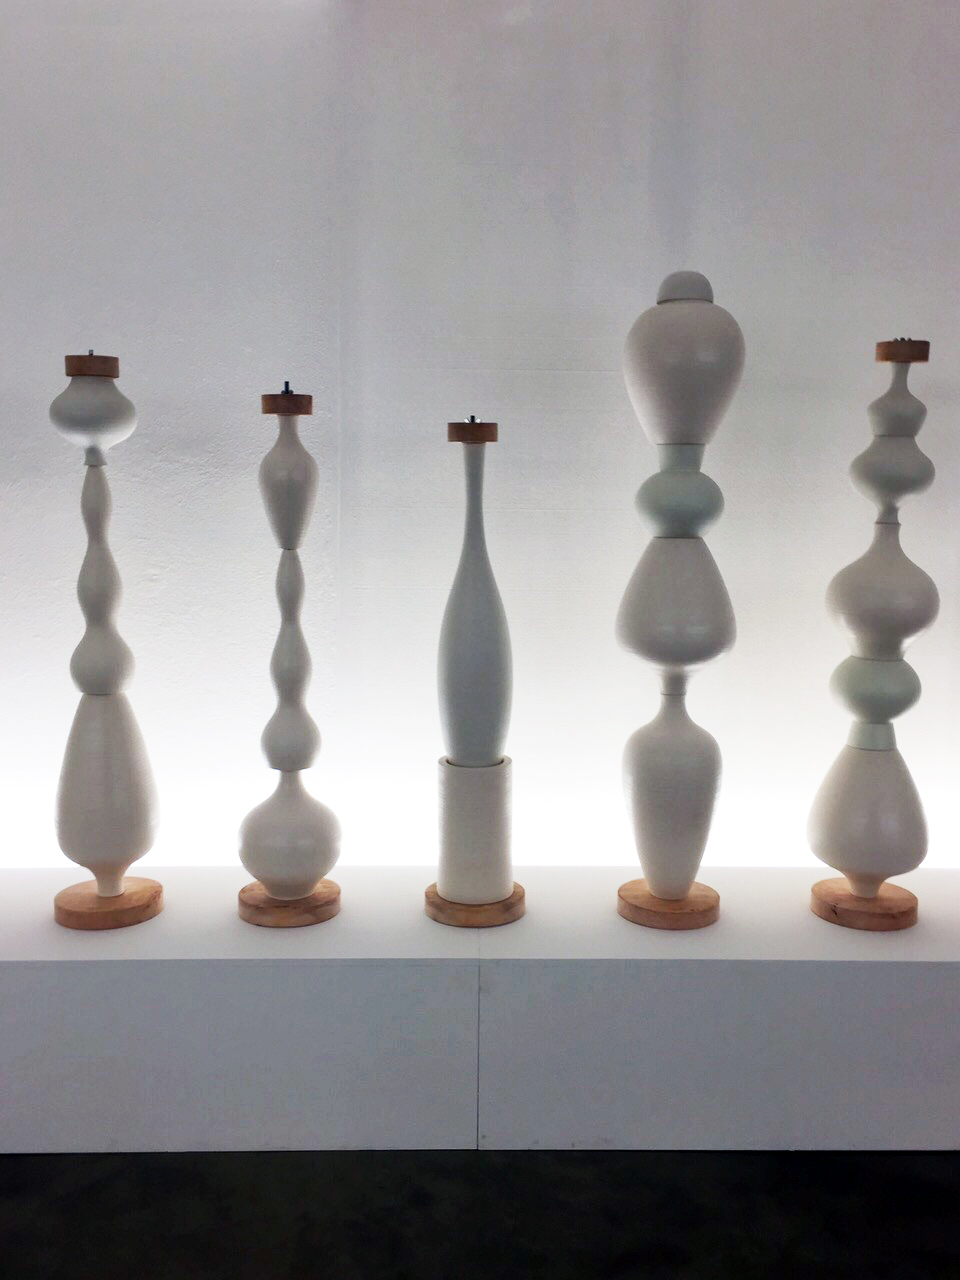 Totems AC by Matteo Thun Atelier